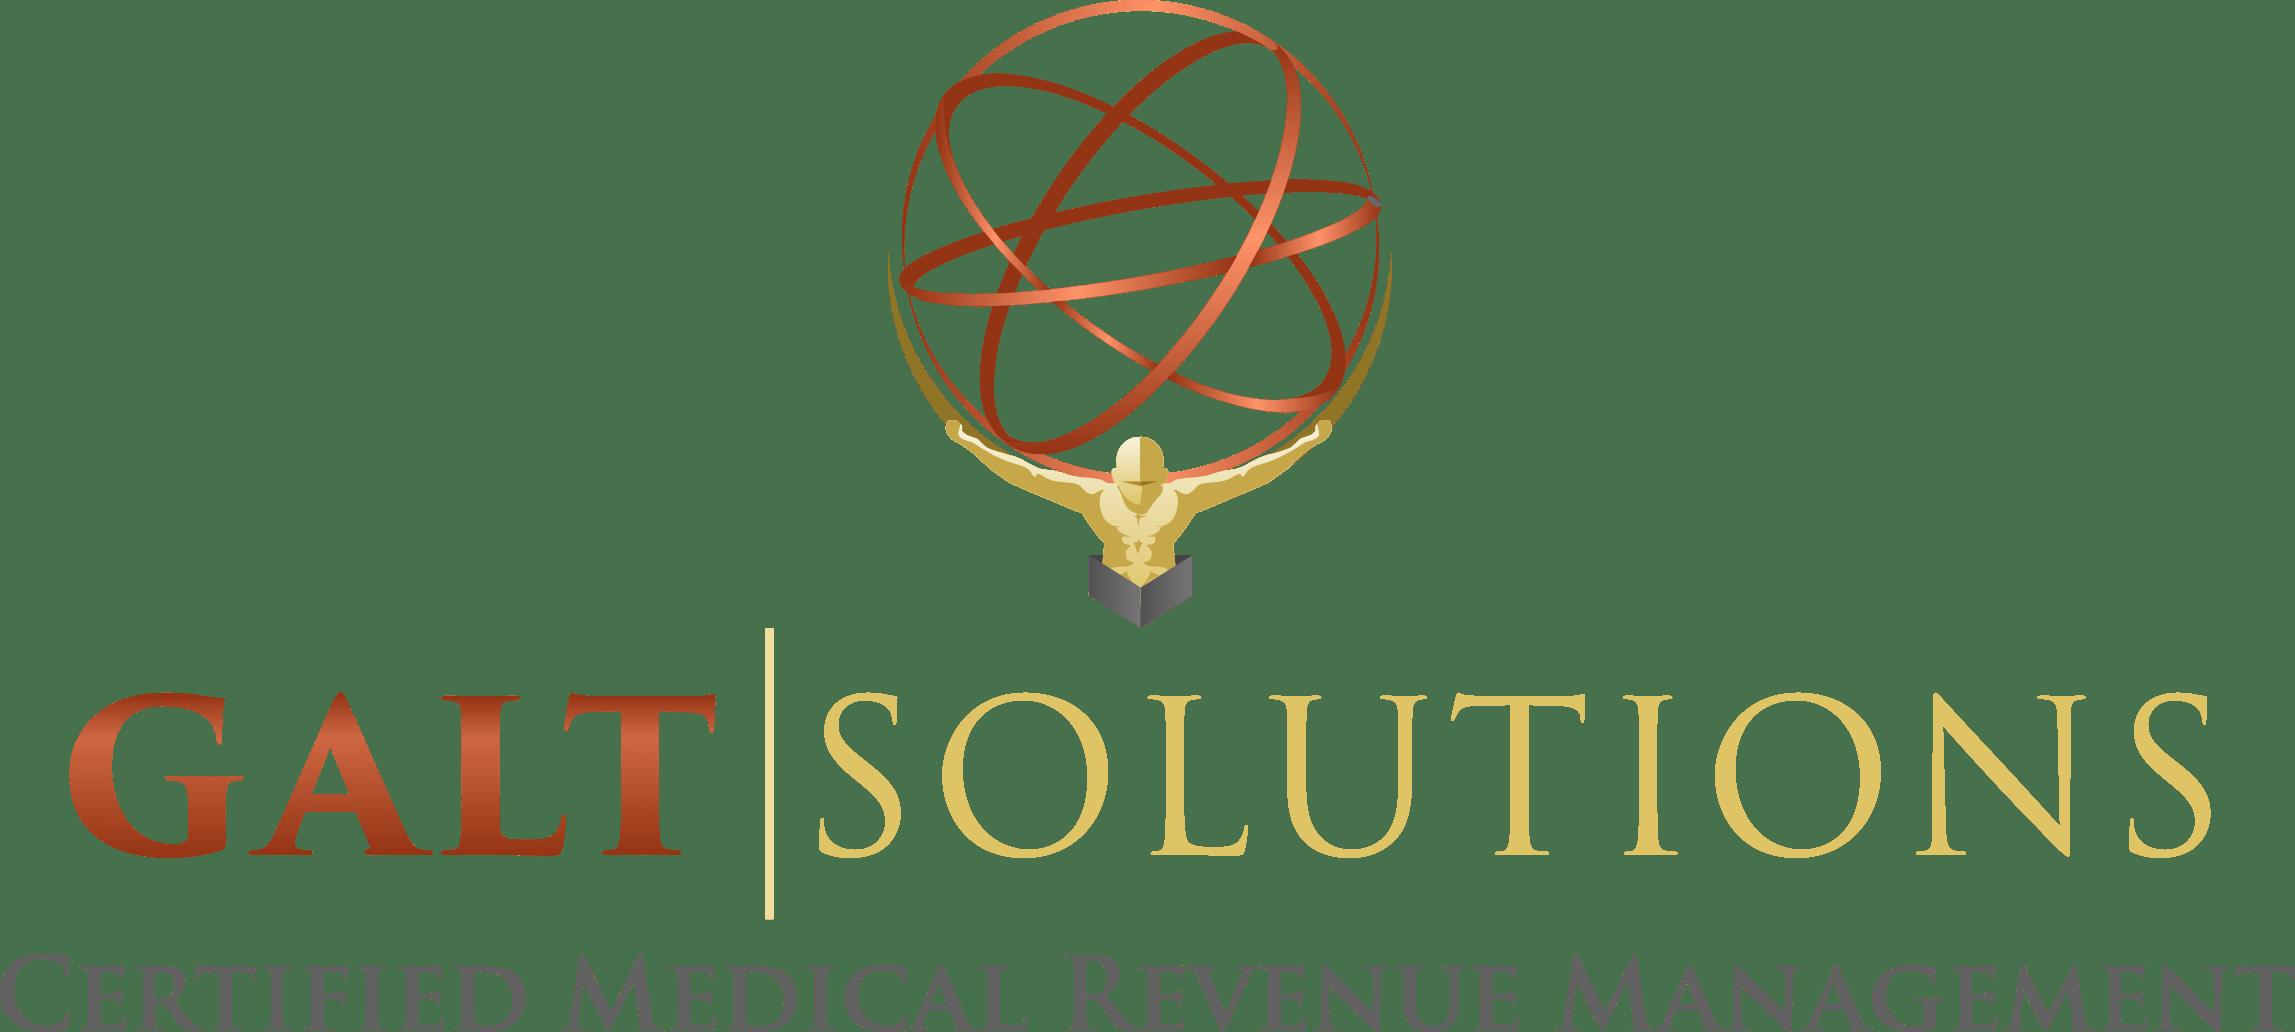 Galt Solutions